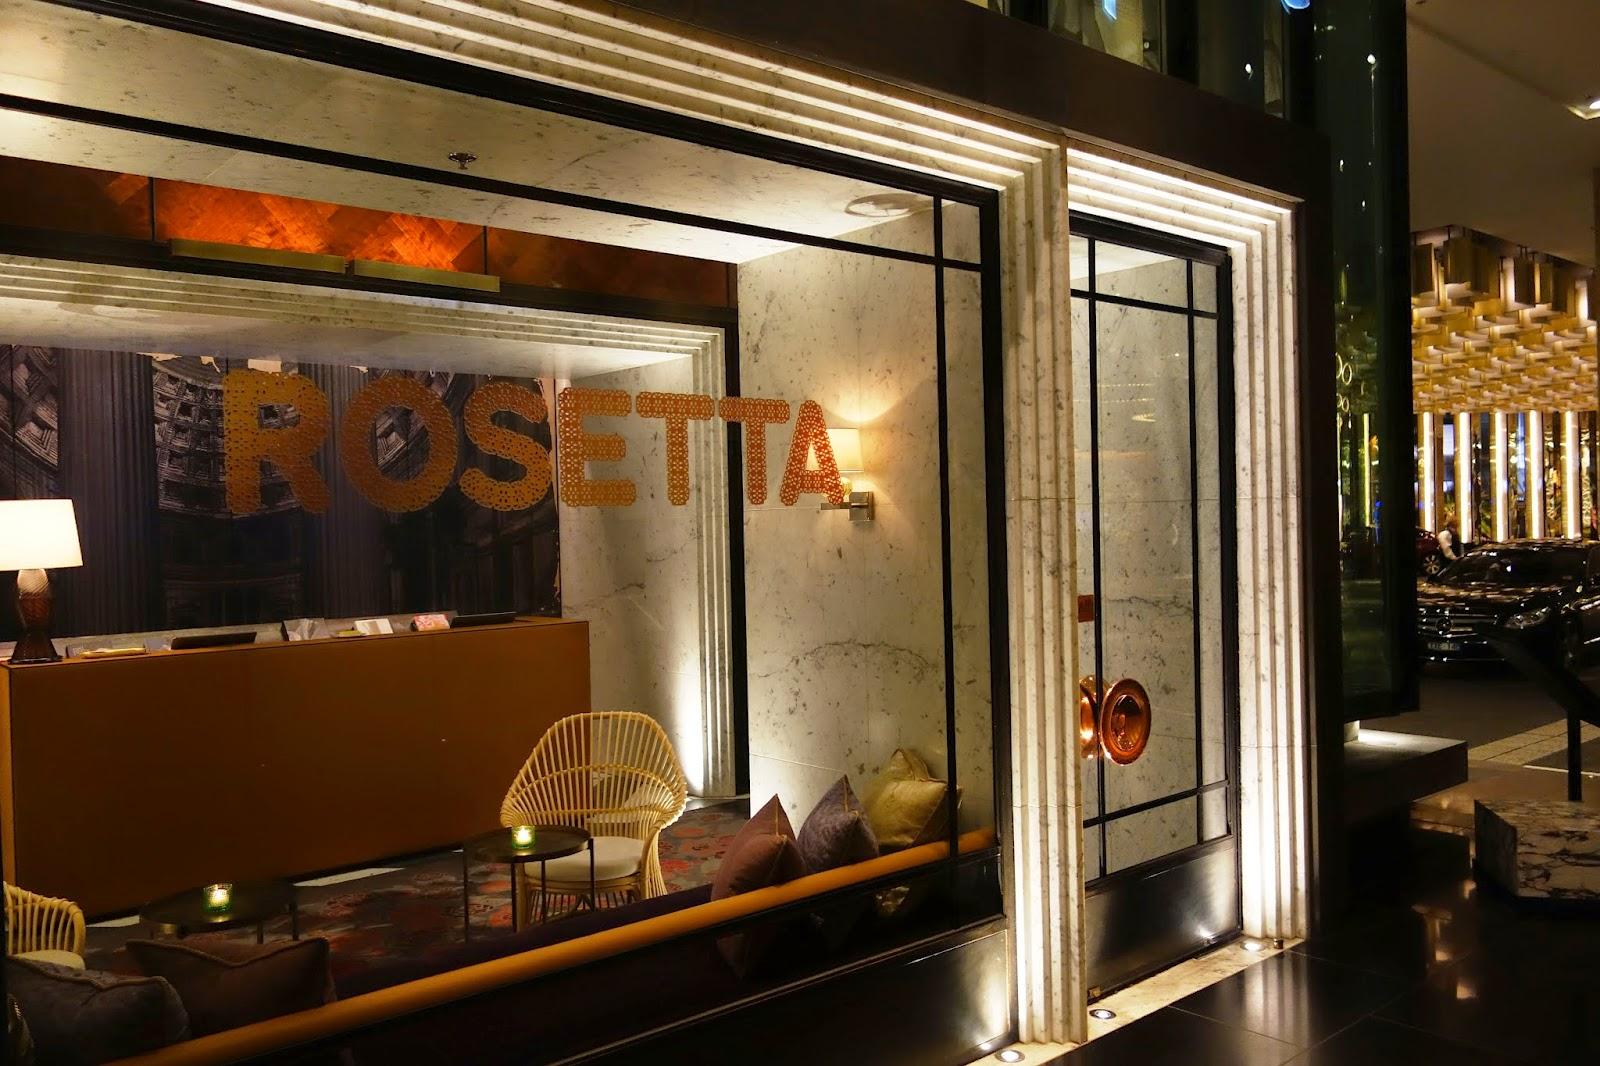 Restaurants - Rosetta